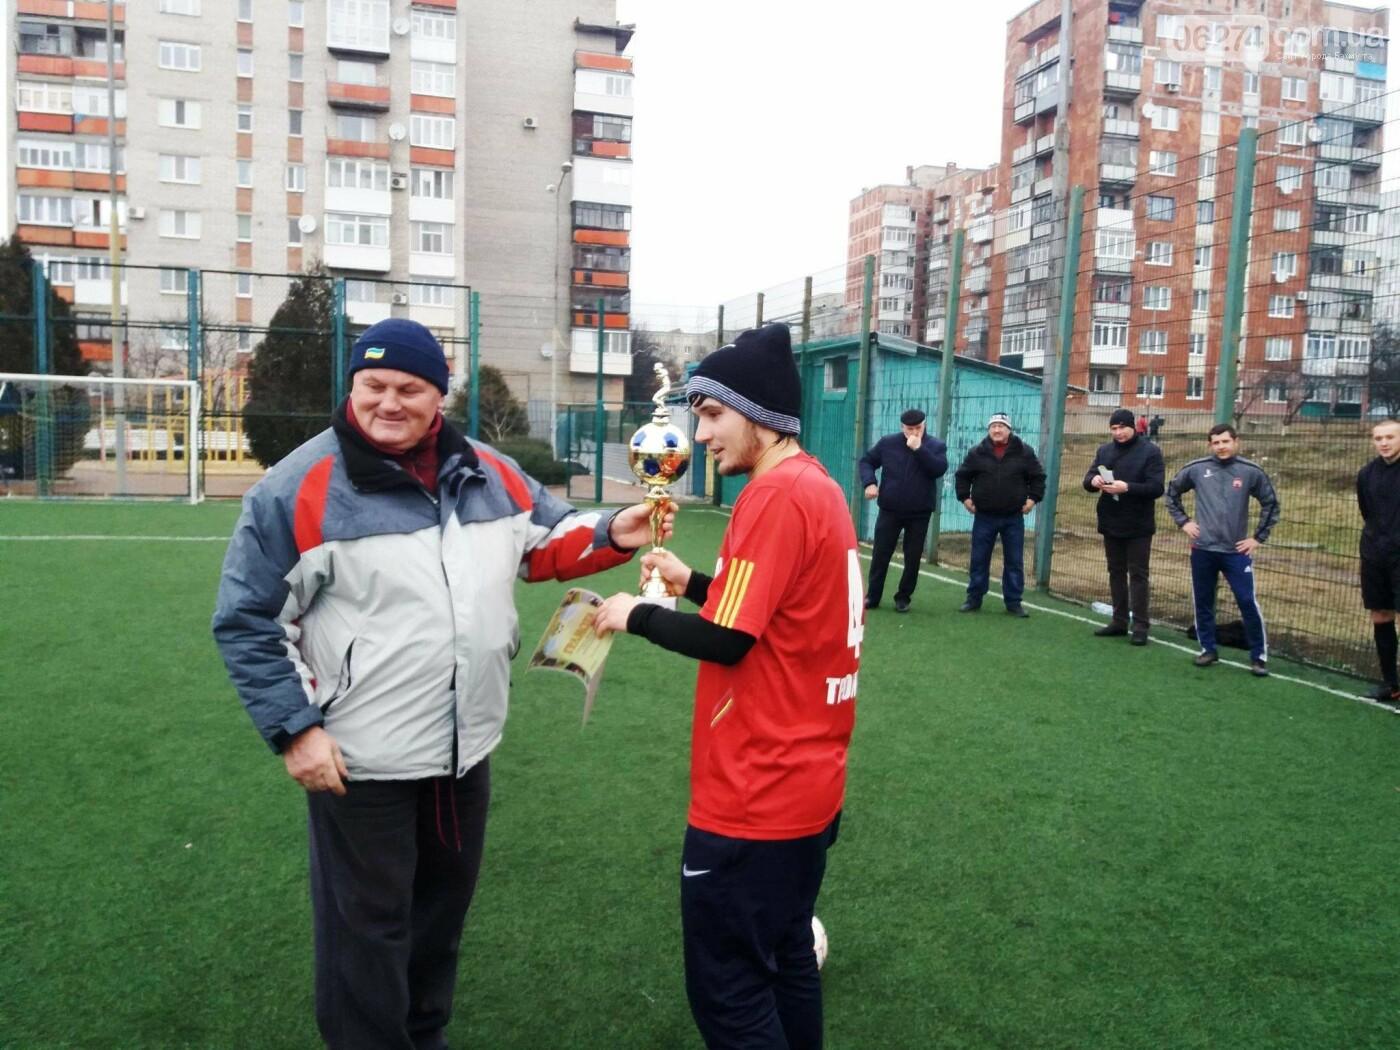 Кубок мэра по футболу из Бахмута отправился в Троицкое, фото-3